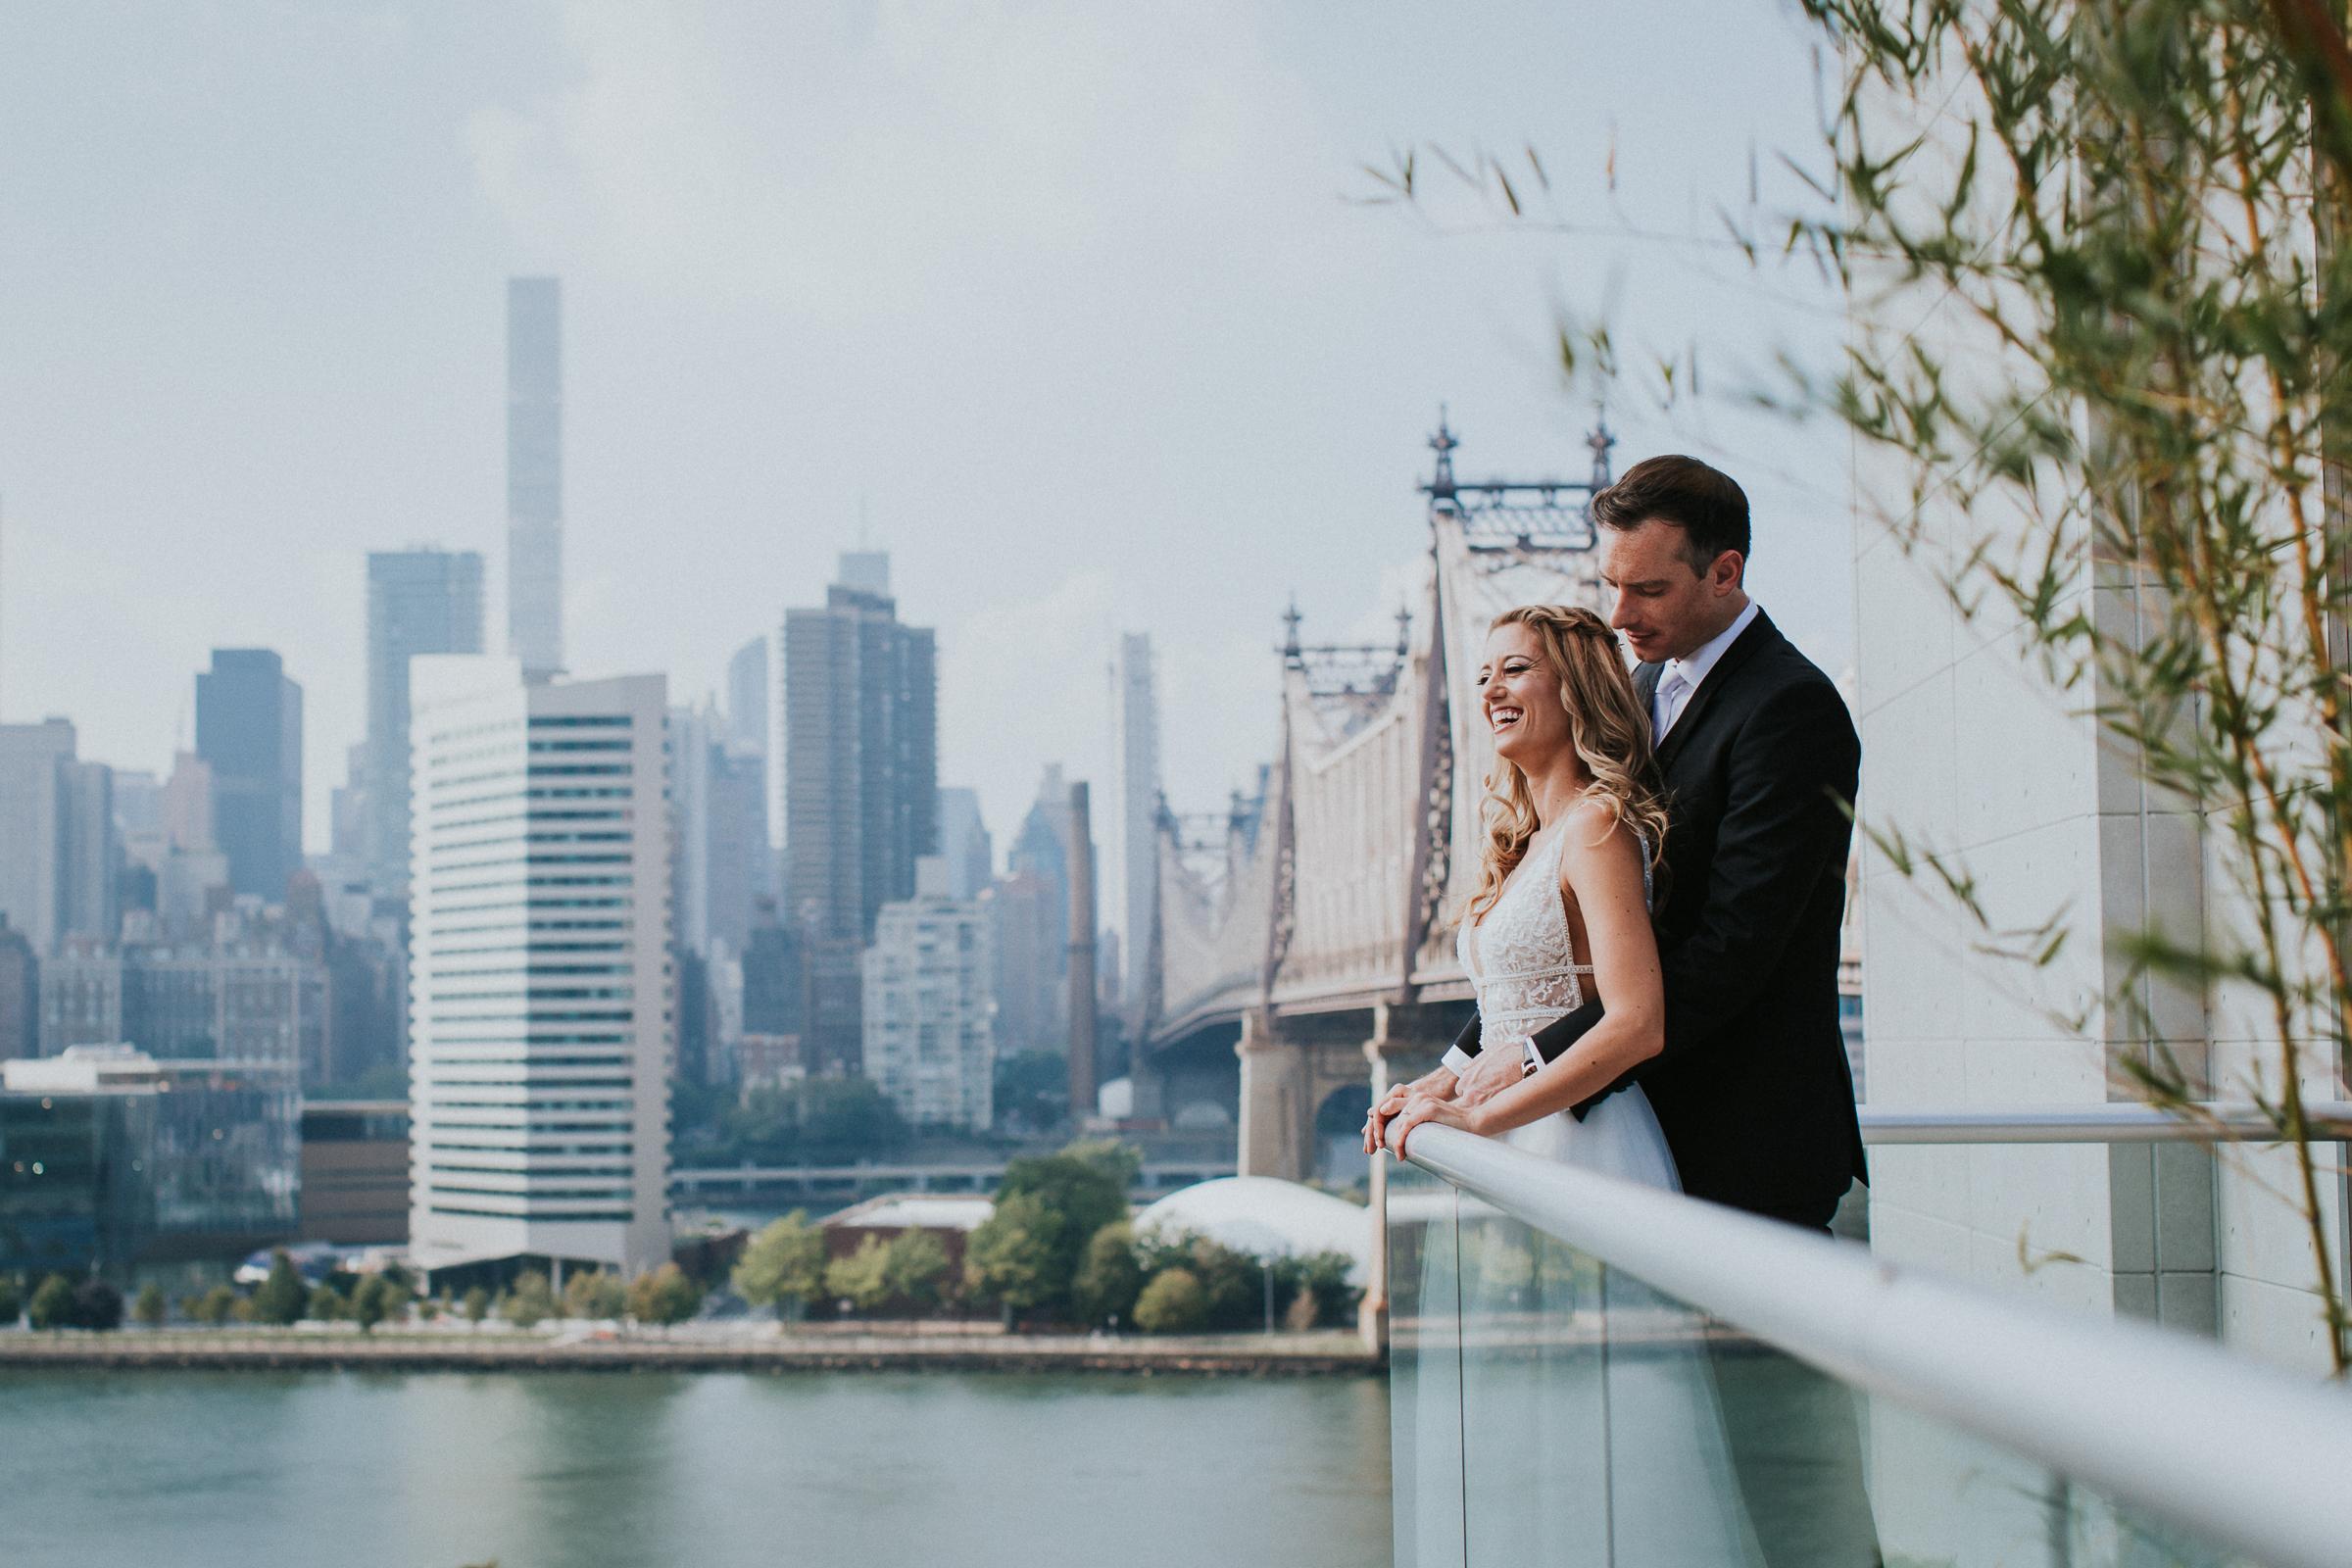 Ravel-Hotel-Penthouse-808-Long-Island-City-New-York-Documentary-Wedding-Photographer-28.jpg